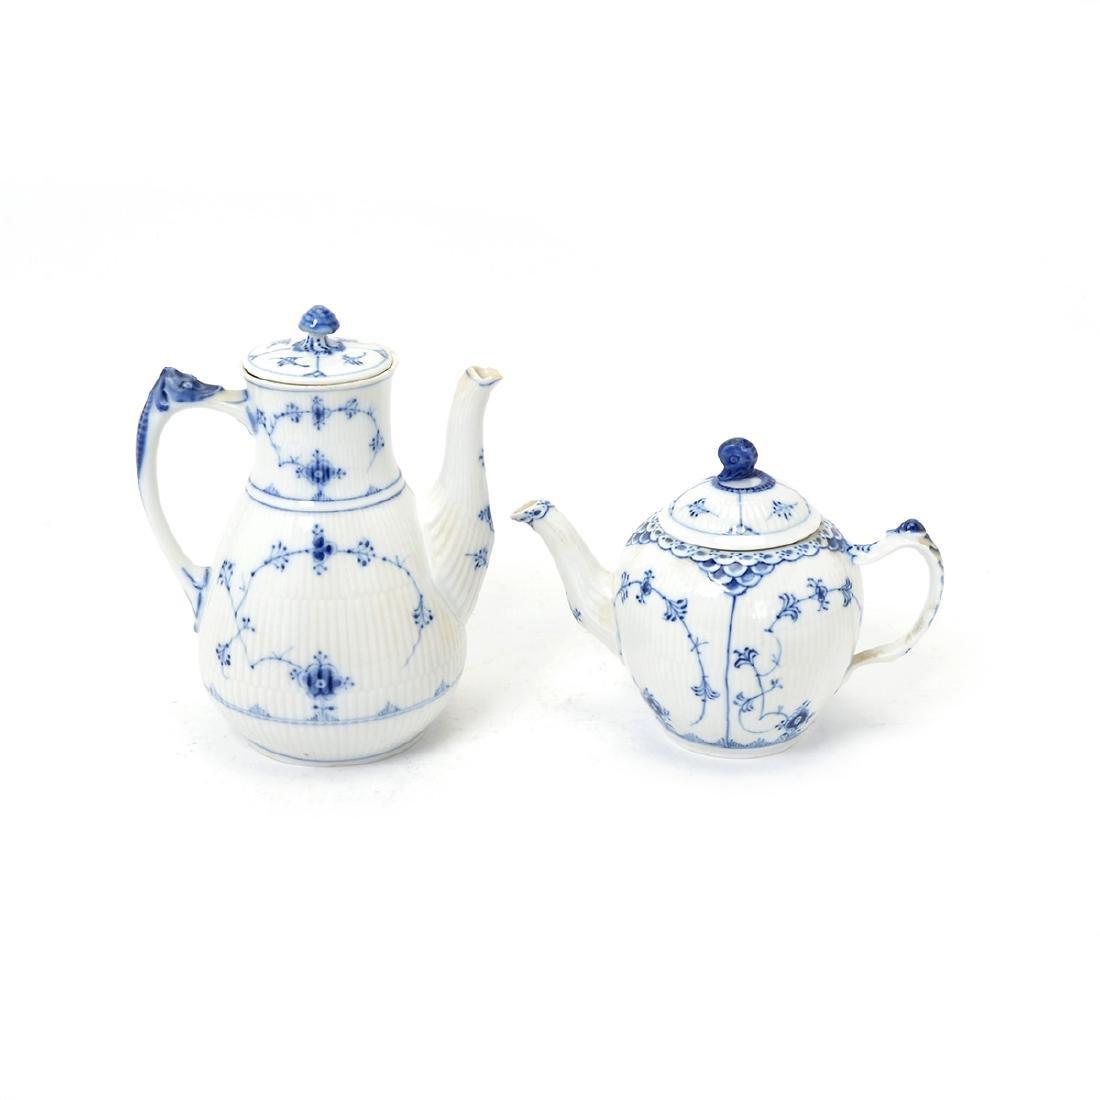 Royal Copenhagen Porcelain Serving and Table Articles - 3